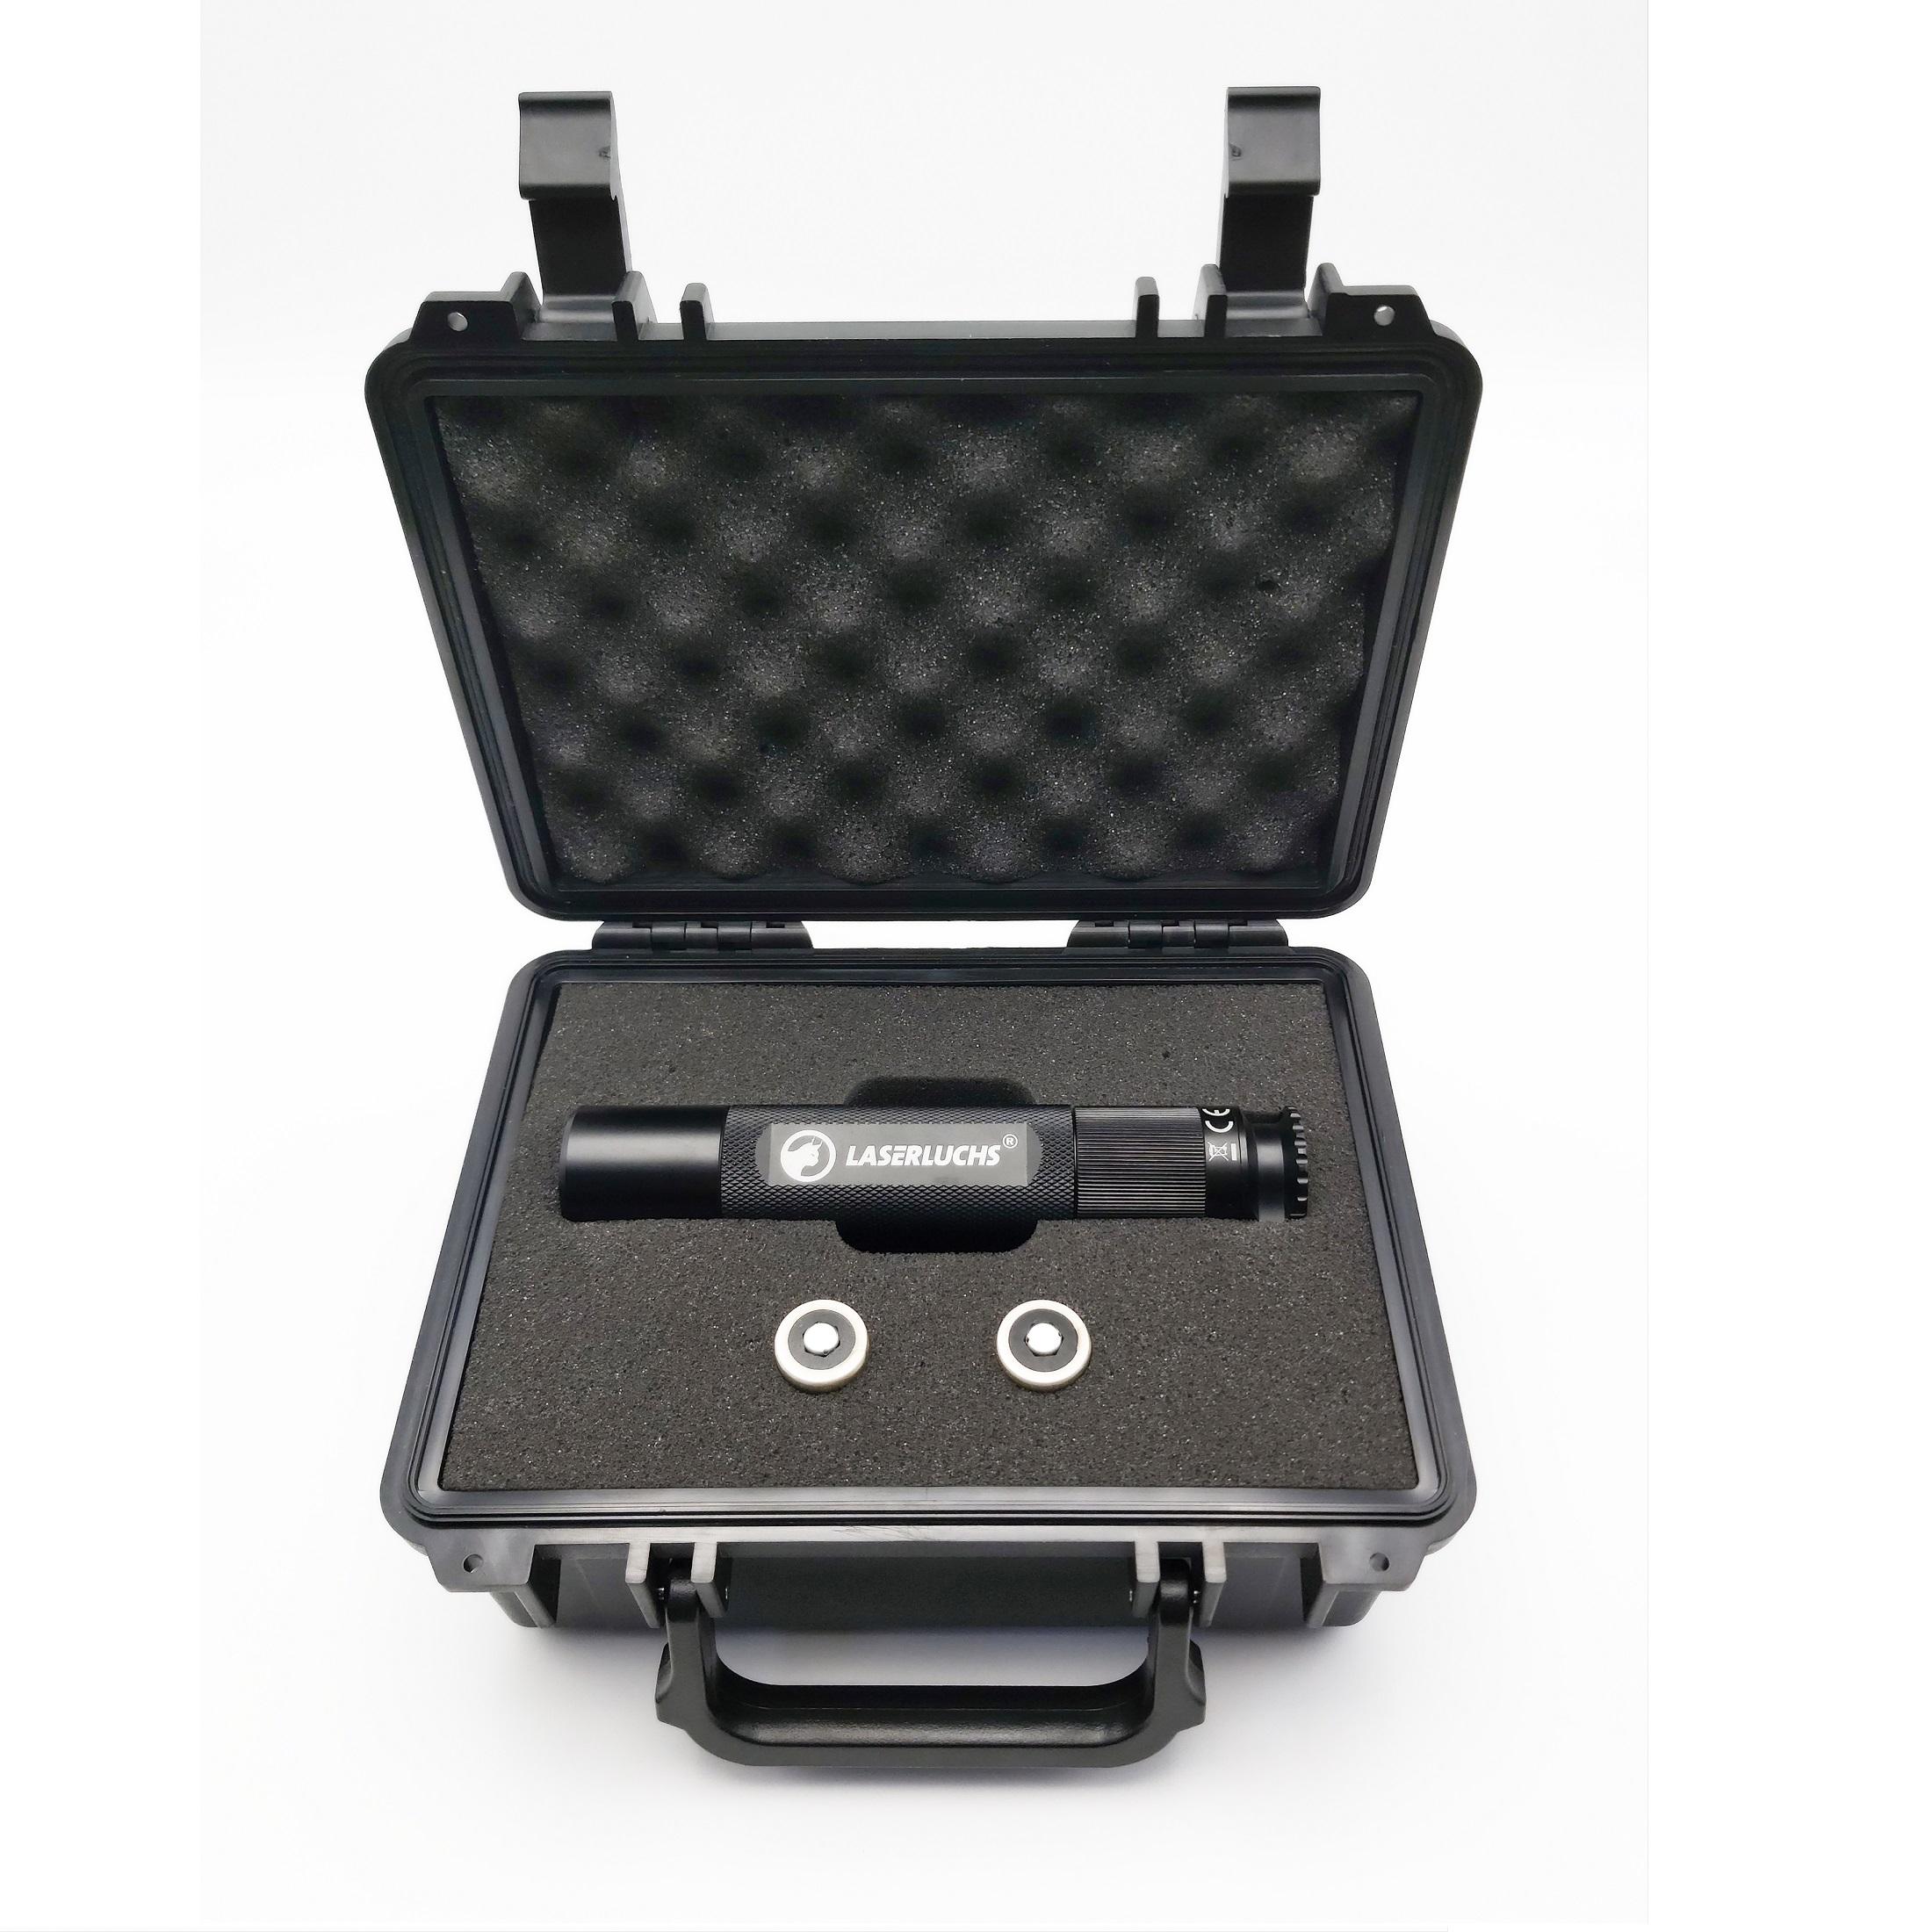 Laserluchs Tactical PICO-K9-SPOT-V1